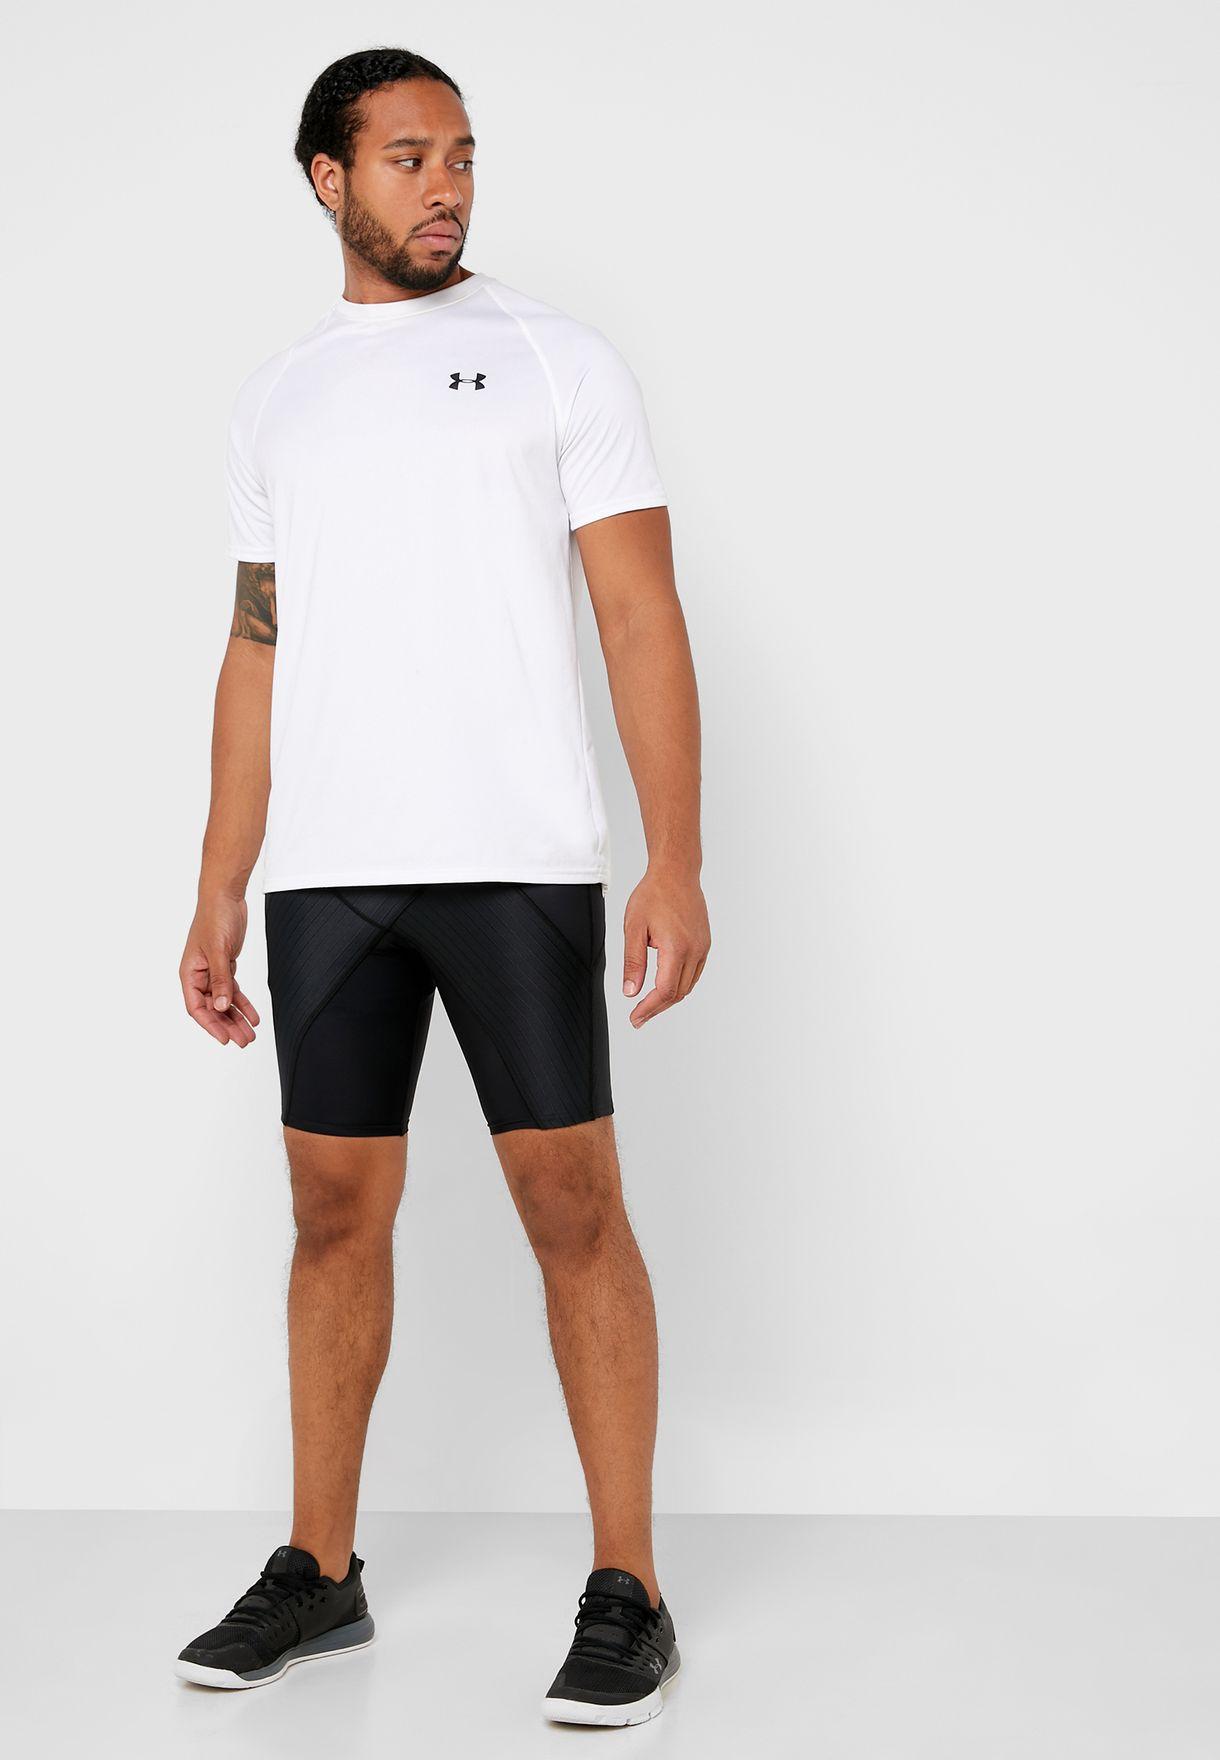 Project Rock Compression Shorts